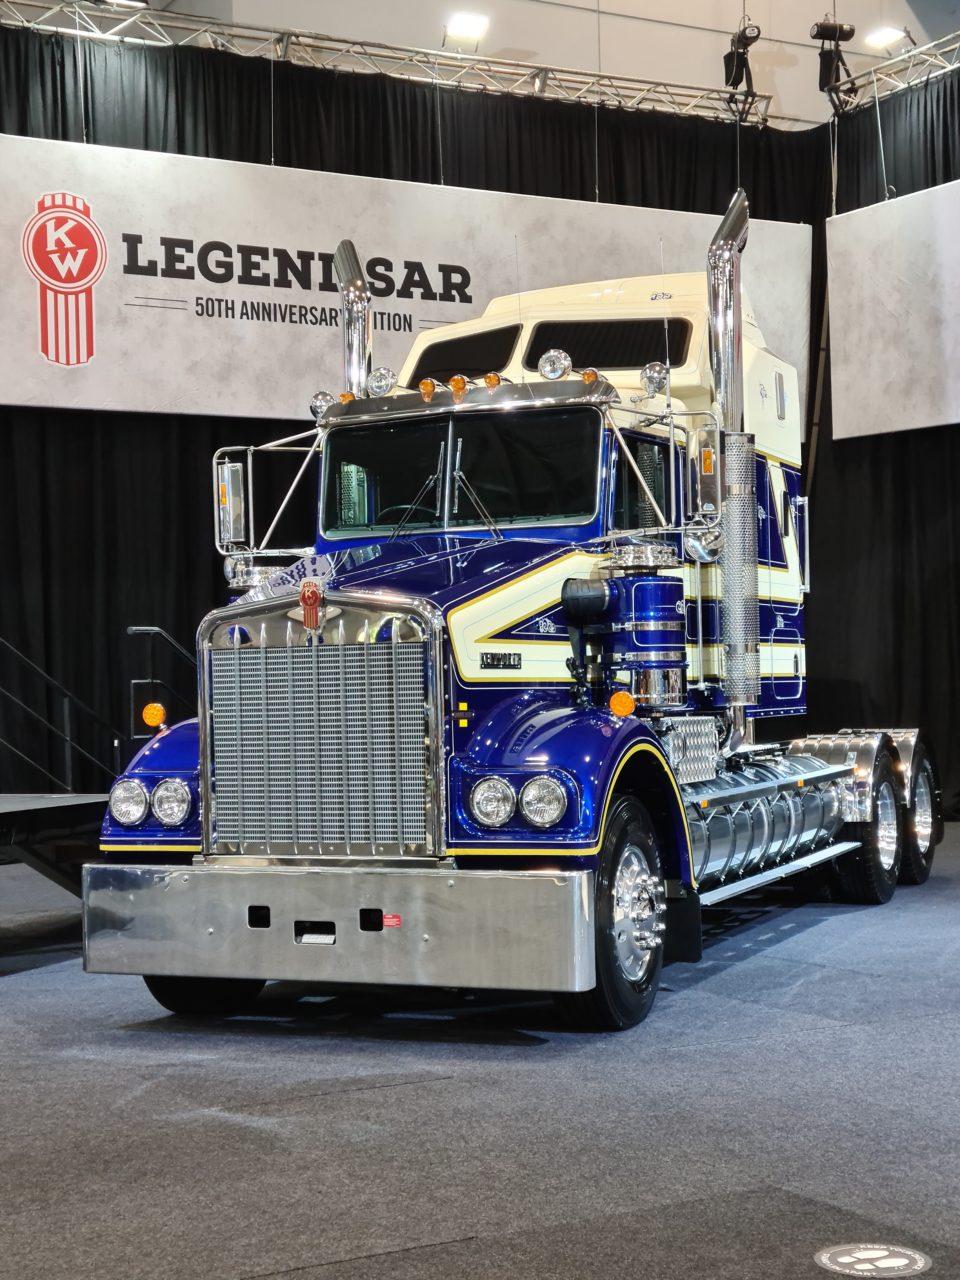 Kenworth 50th Anniversary Edition Legend SAR Truck Unveiled 1